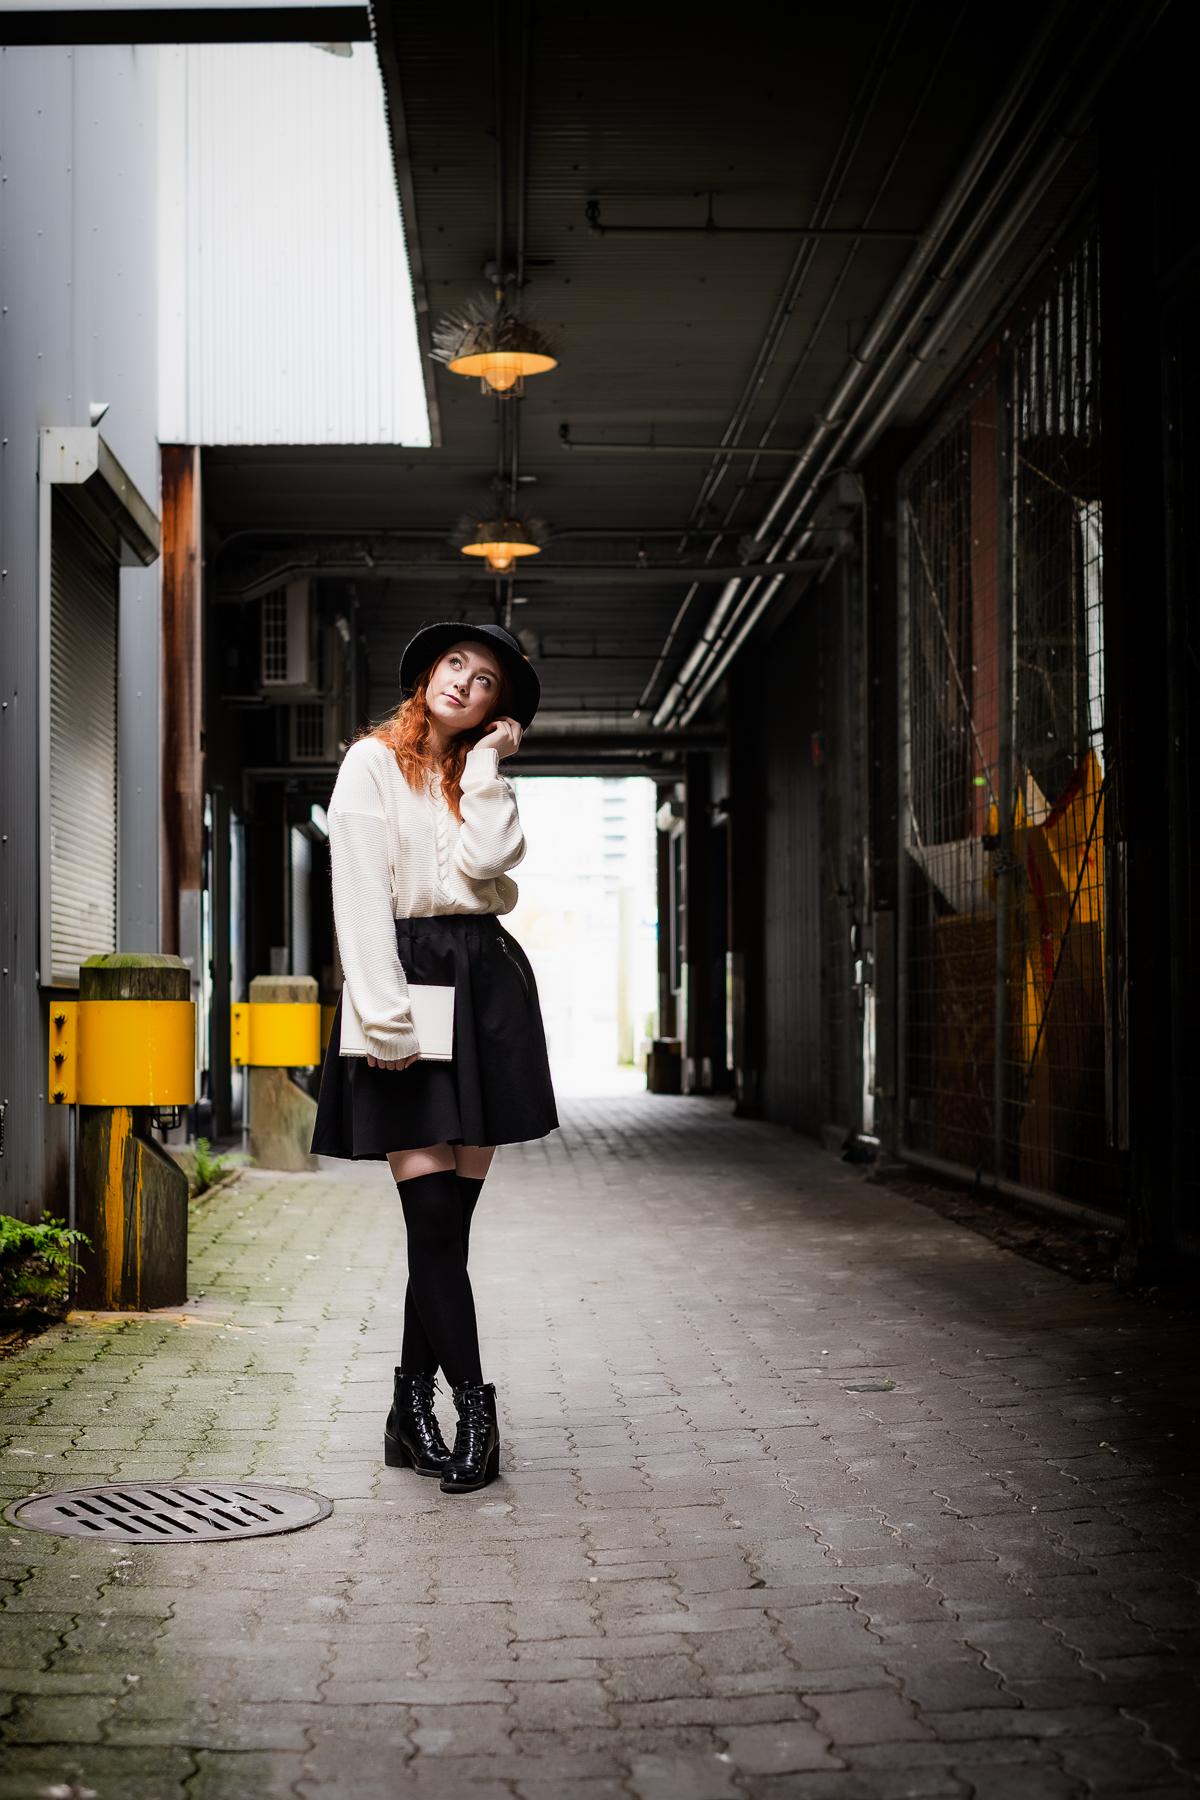 Model: Rachel Sargeant | Hair and makeup: Evelyn Affleck